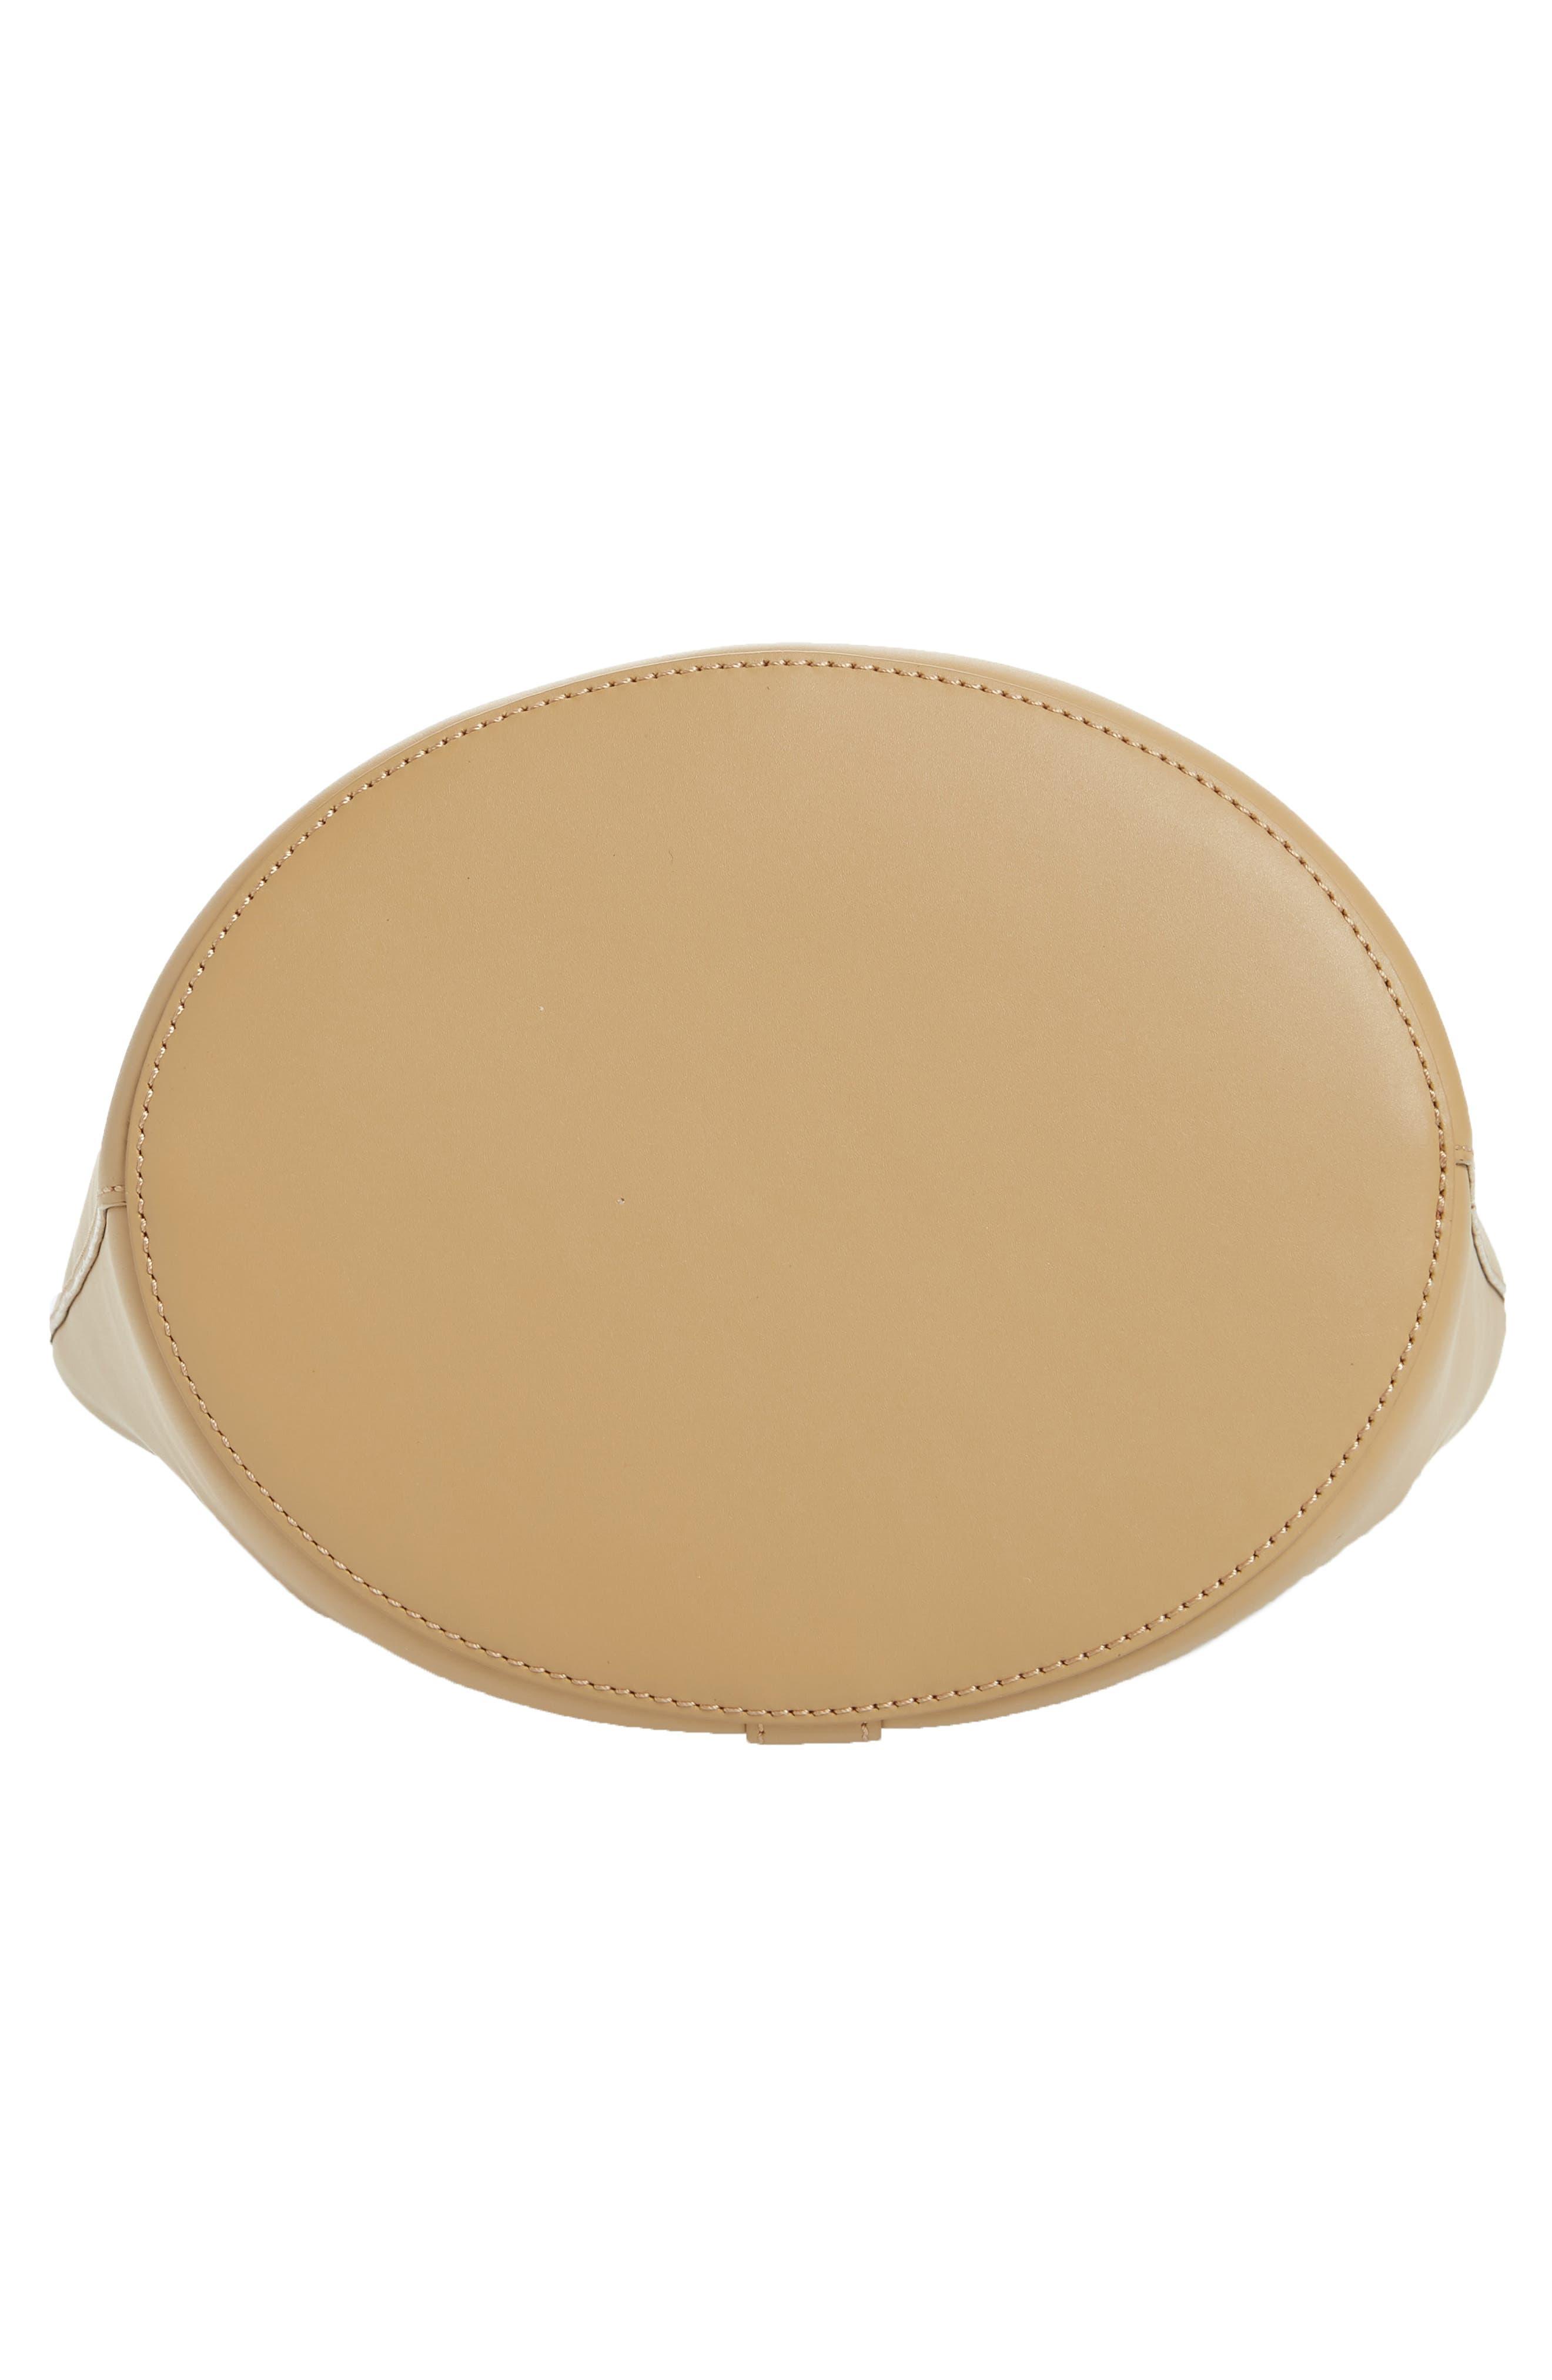 Dome Leather Bucket Bag,                             Alternate thumbnail 7, color,                             LIGHT CAMEL